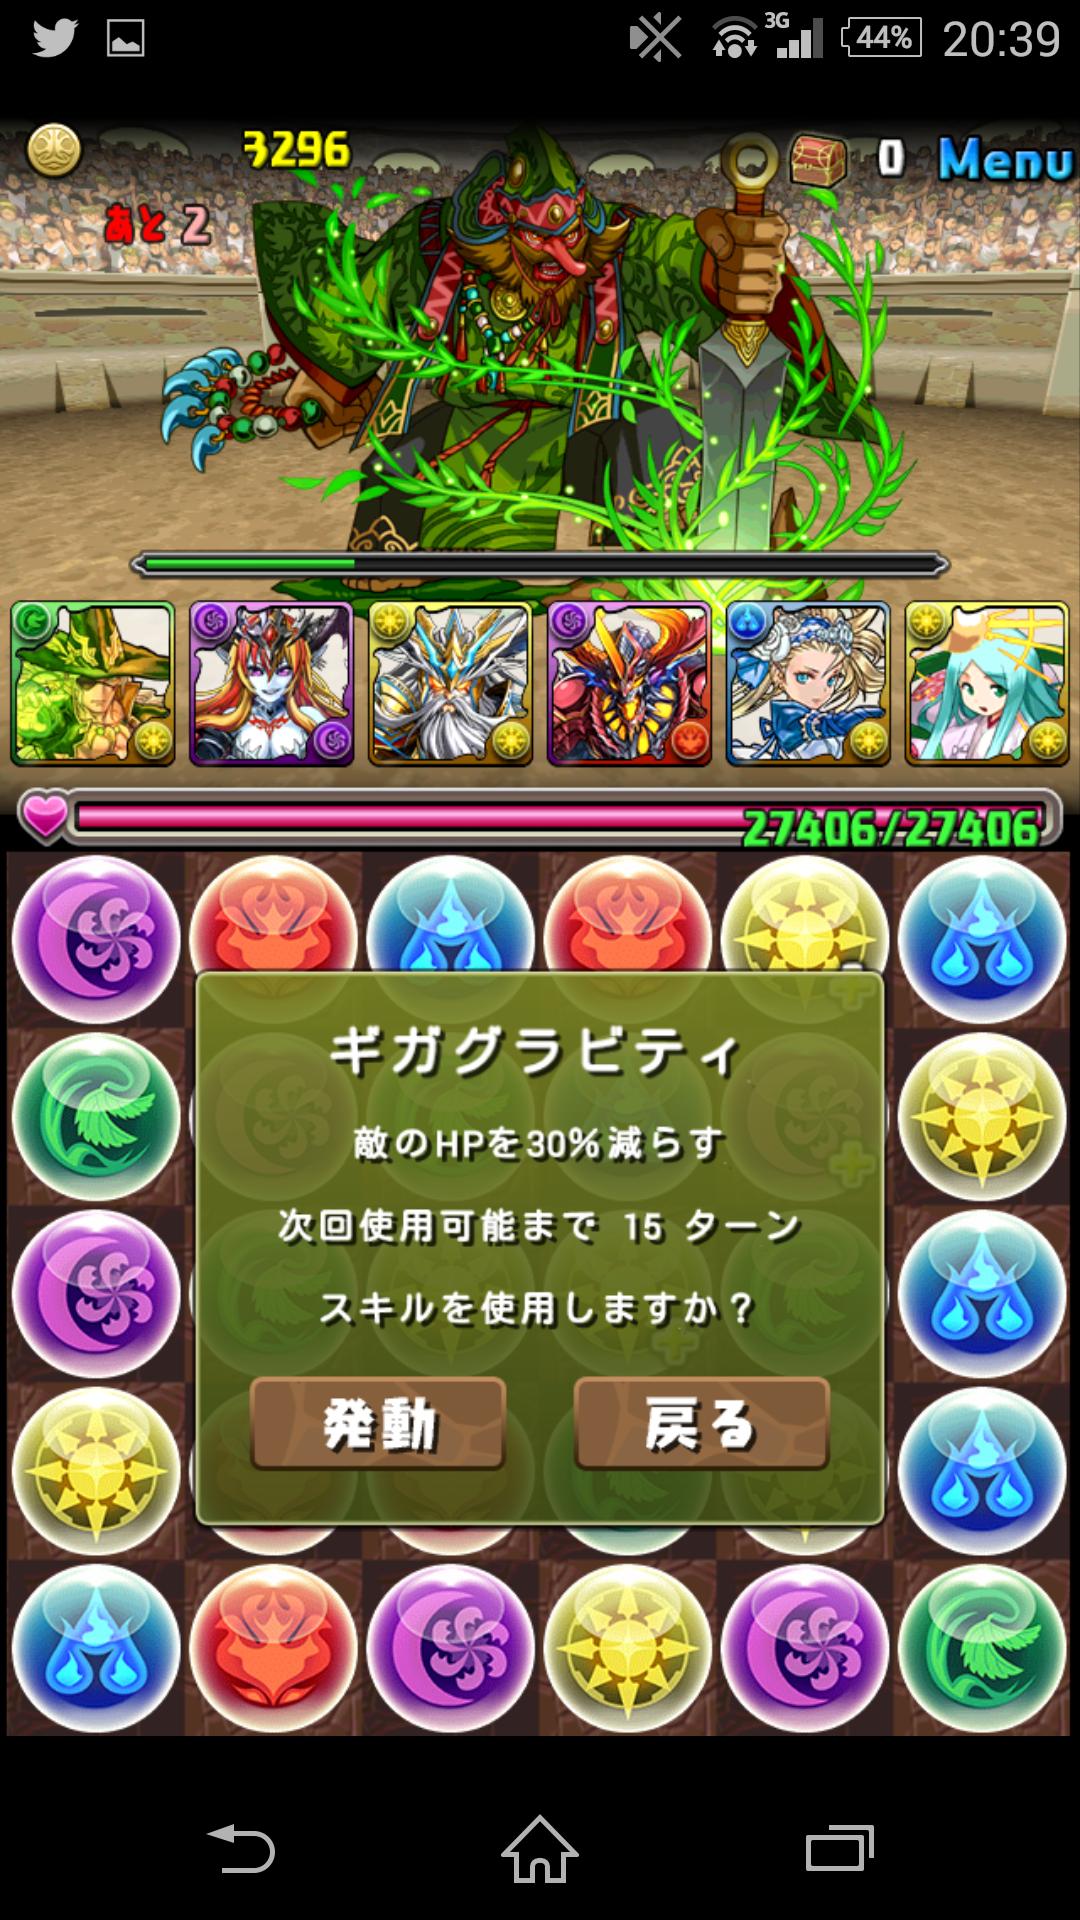 Screenshot_2015-01-29-20-39-31.png